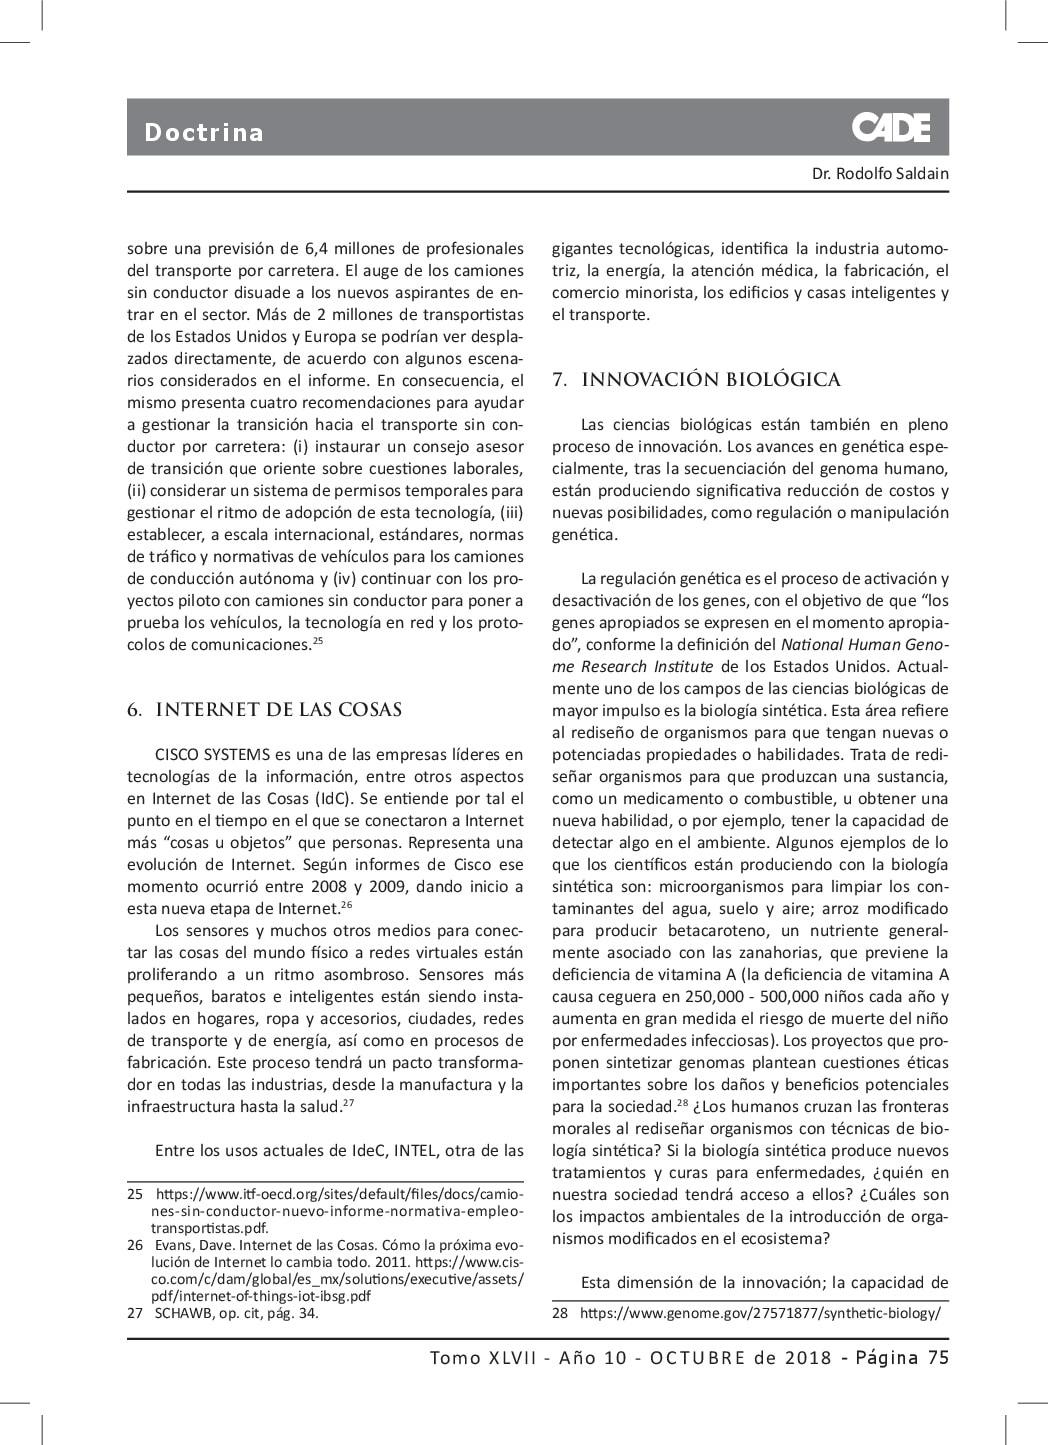 cade-doctrina-jurisprudencia-saldain-007